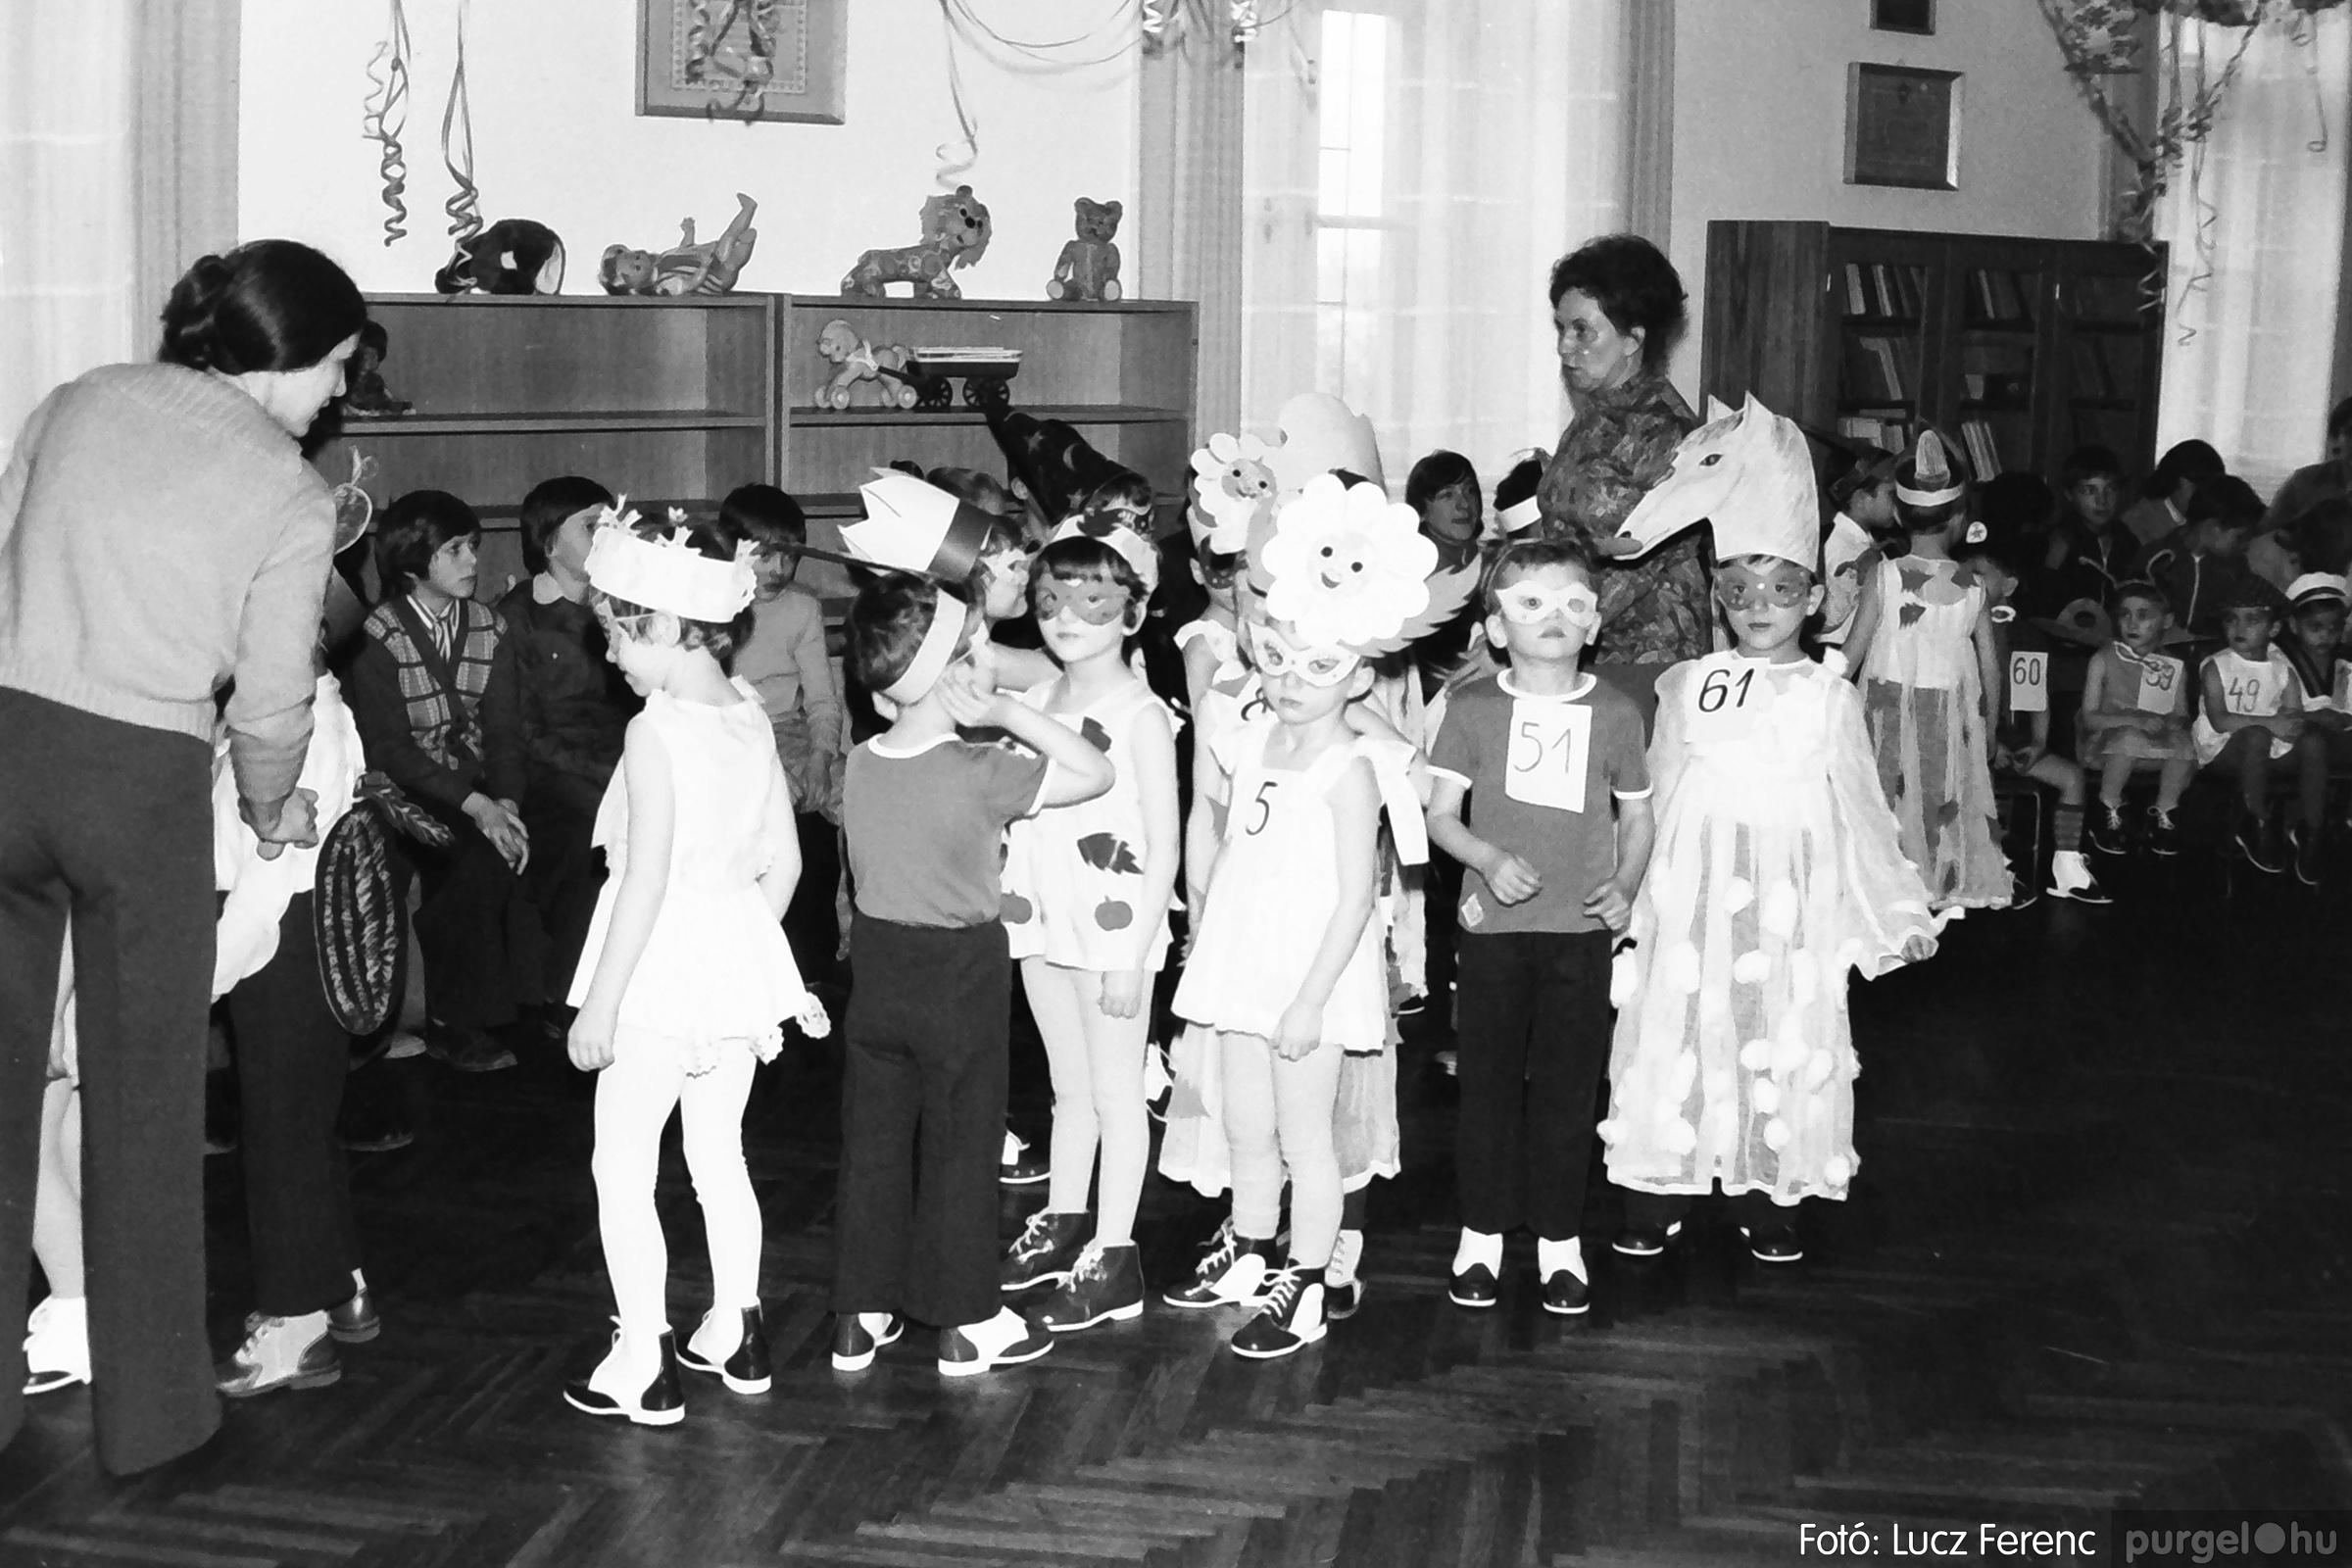 074. 1977. Farsang a gyermekotthonban 005. - Fotó: Lucz Ferenc.jpg